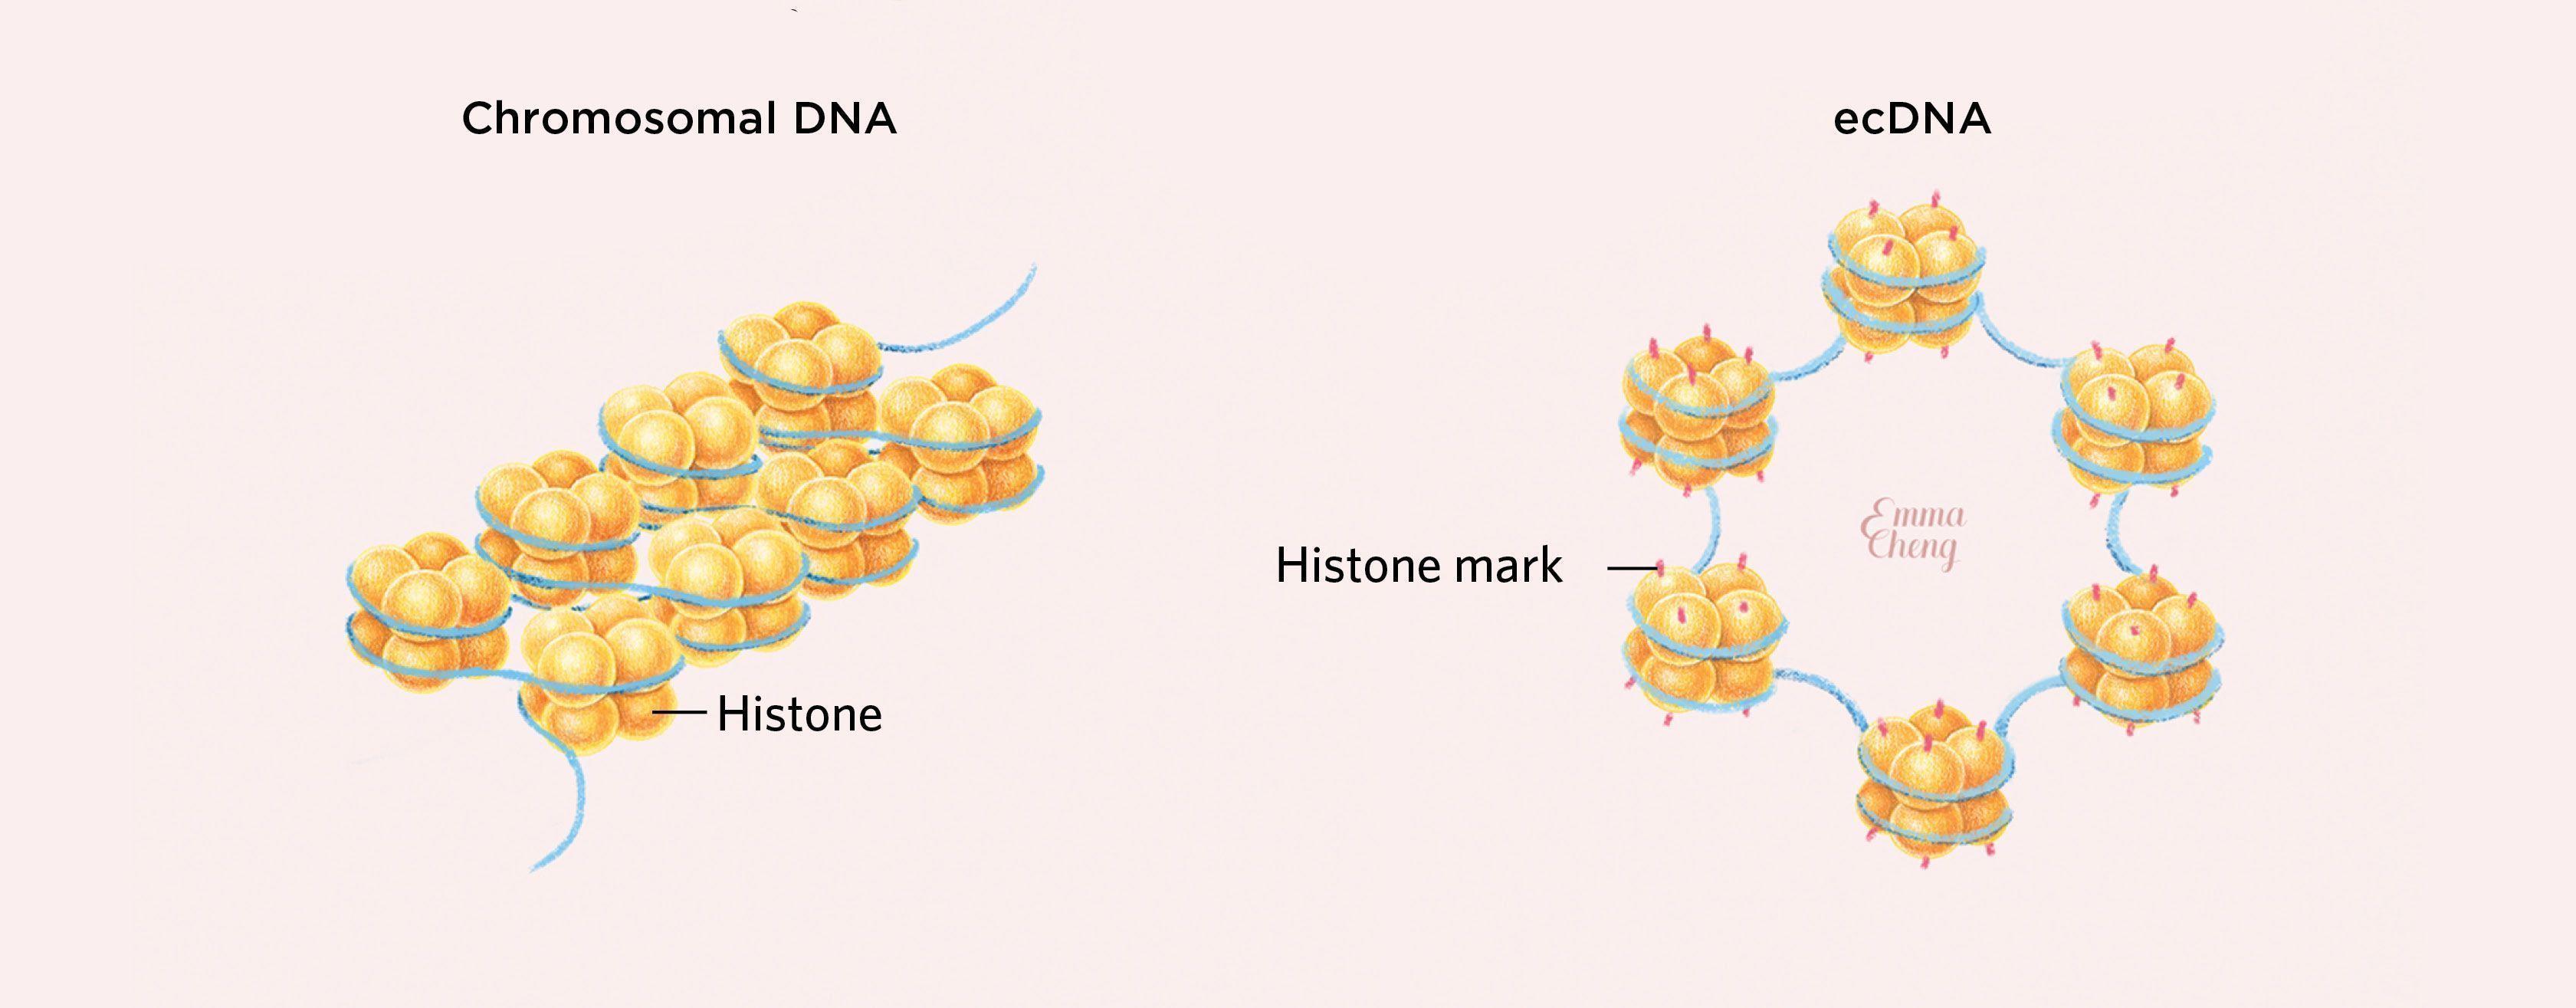 dna-infographic-histone.jpg